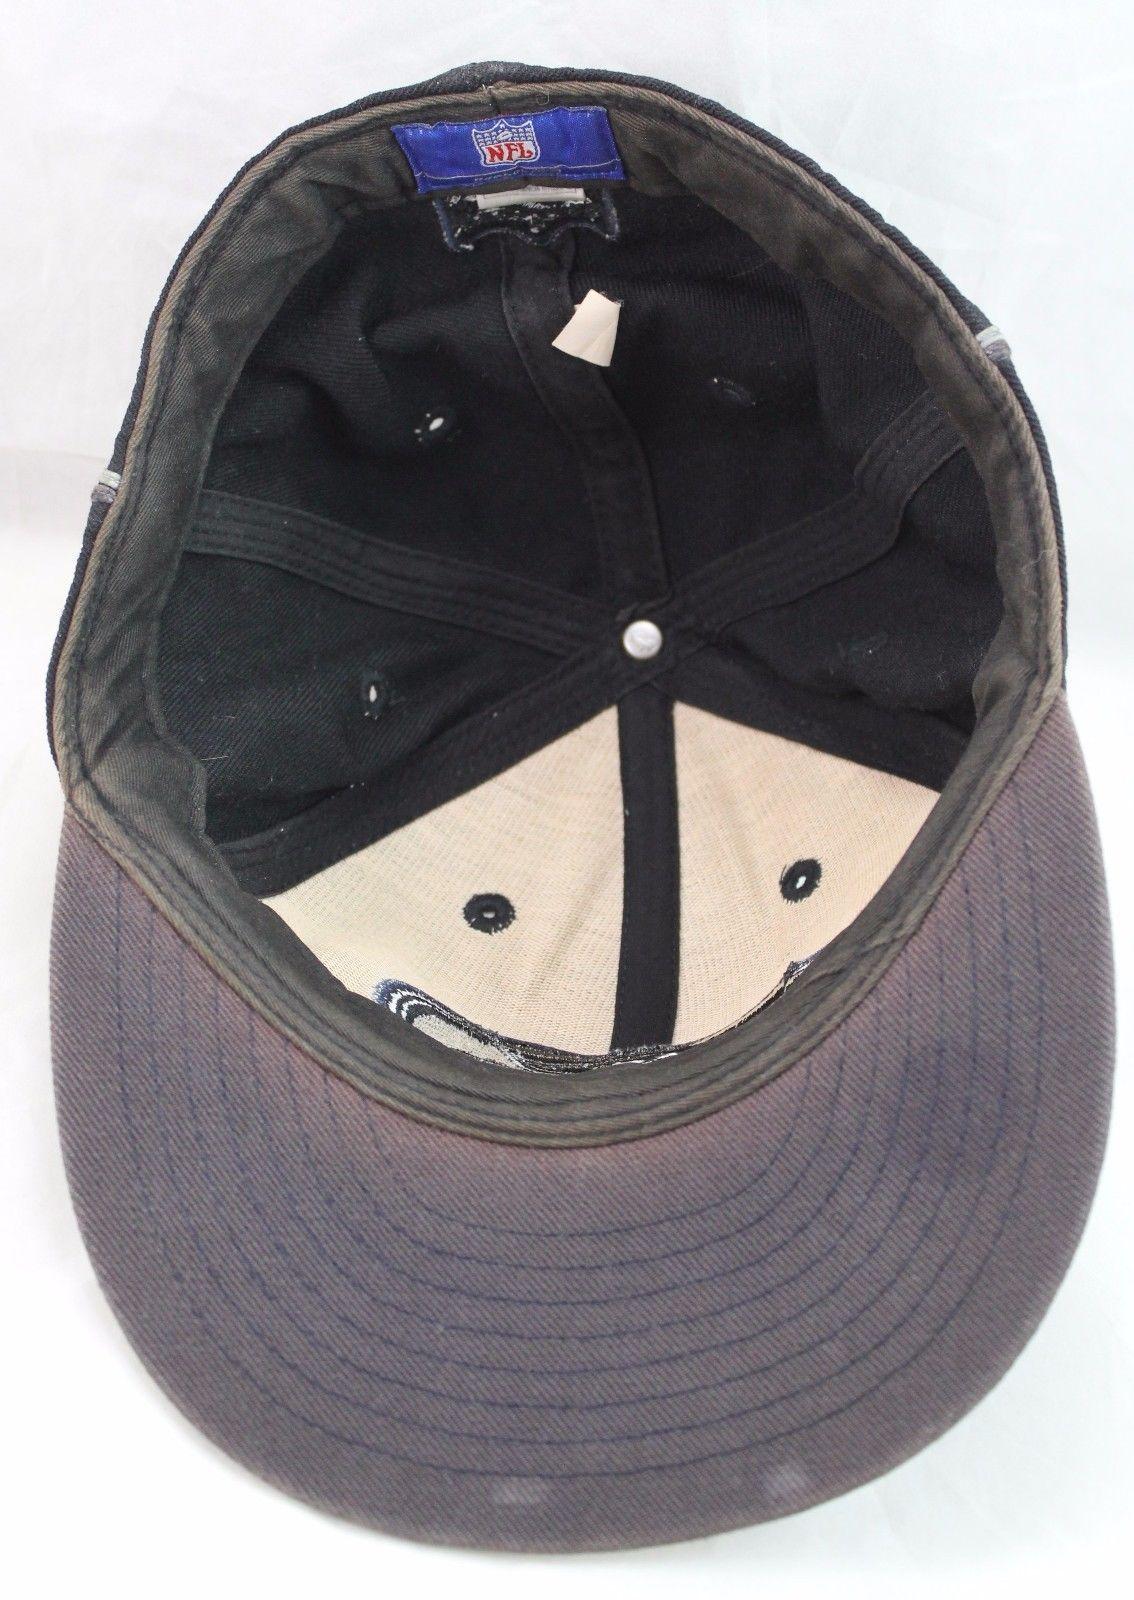 98d2f9fe6c9 Seattle Seahawks NFL Football Dark Embroidered Black Reebok Cap Hat 7-3 8